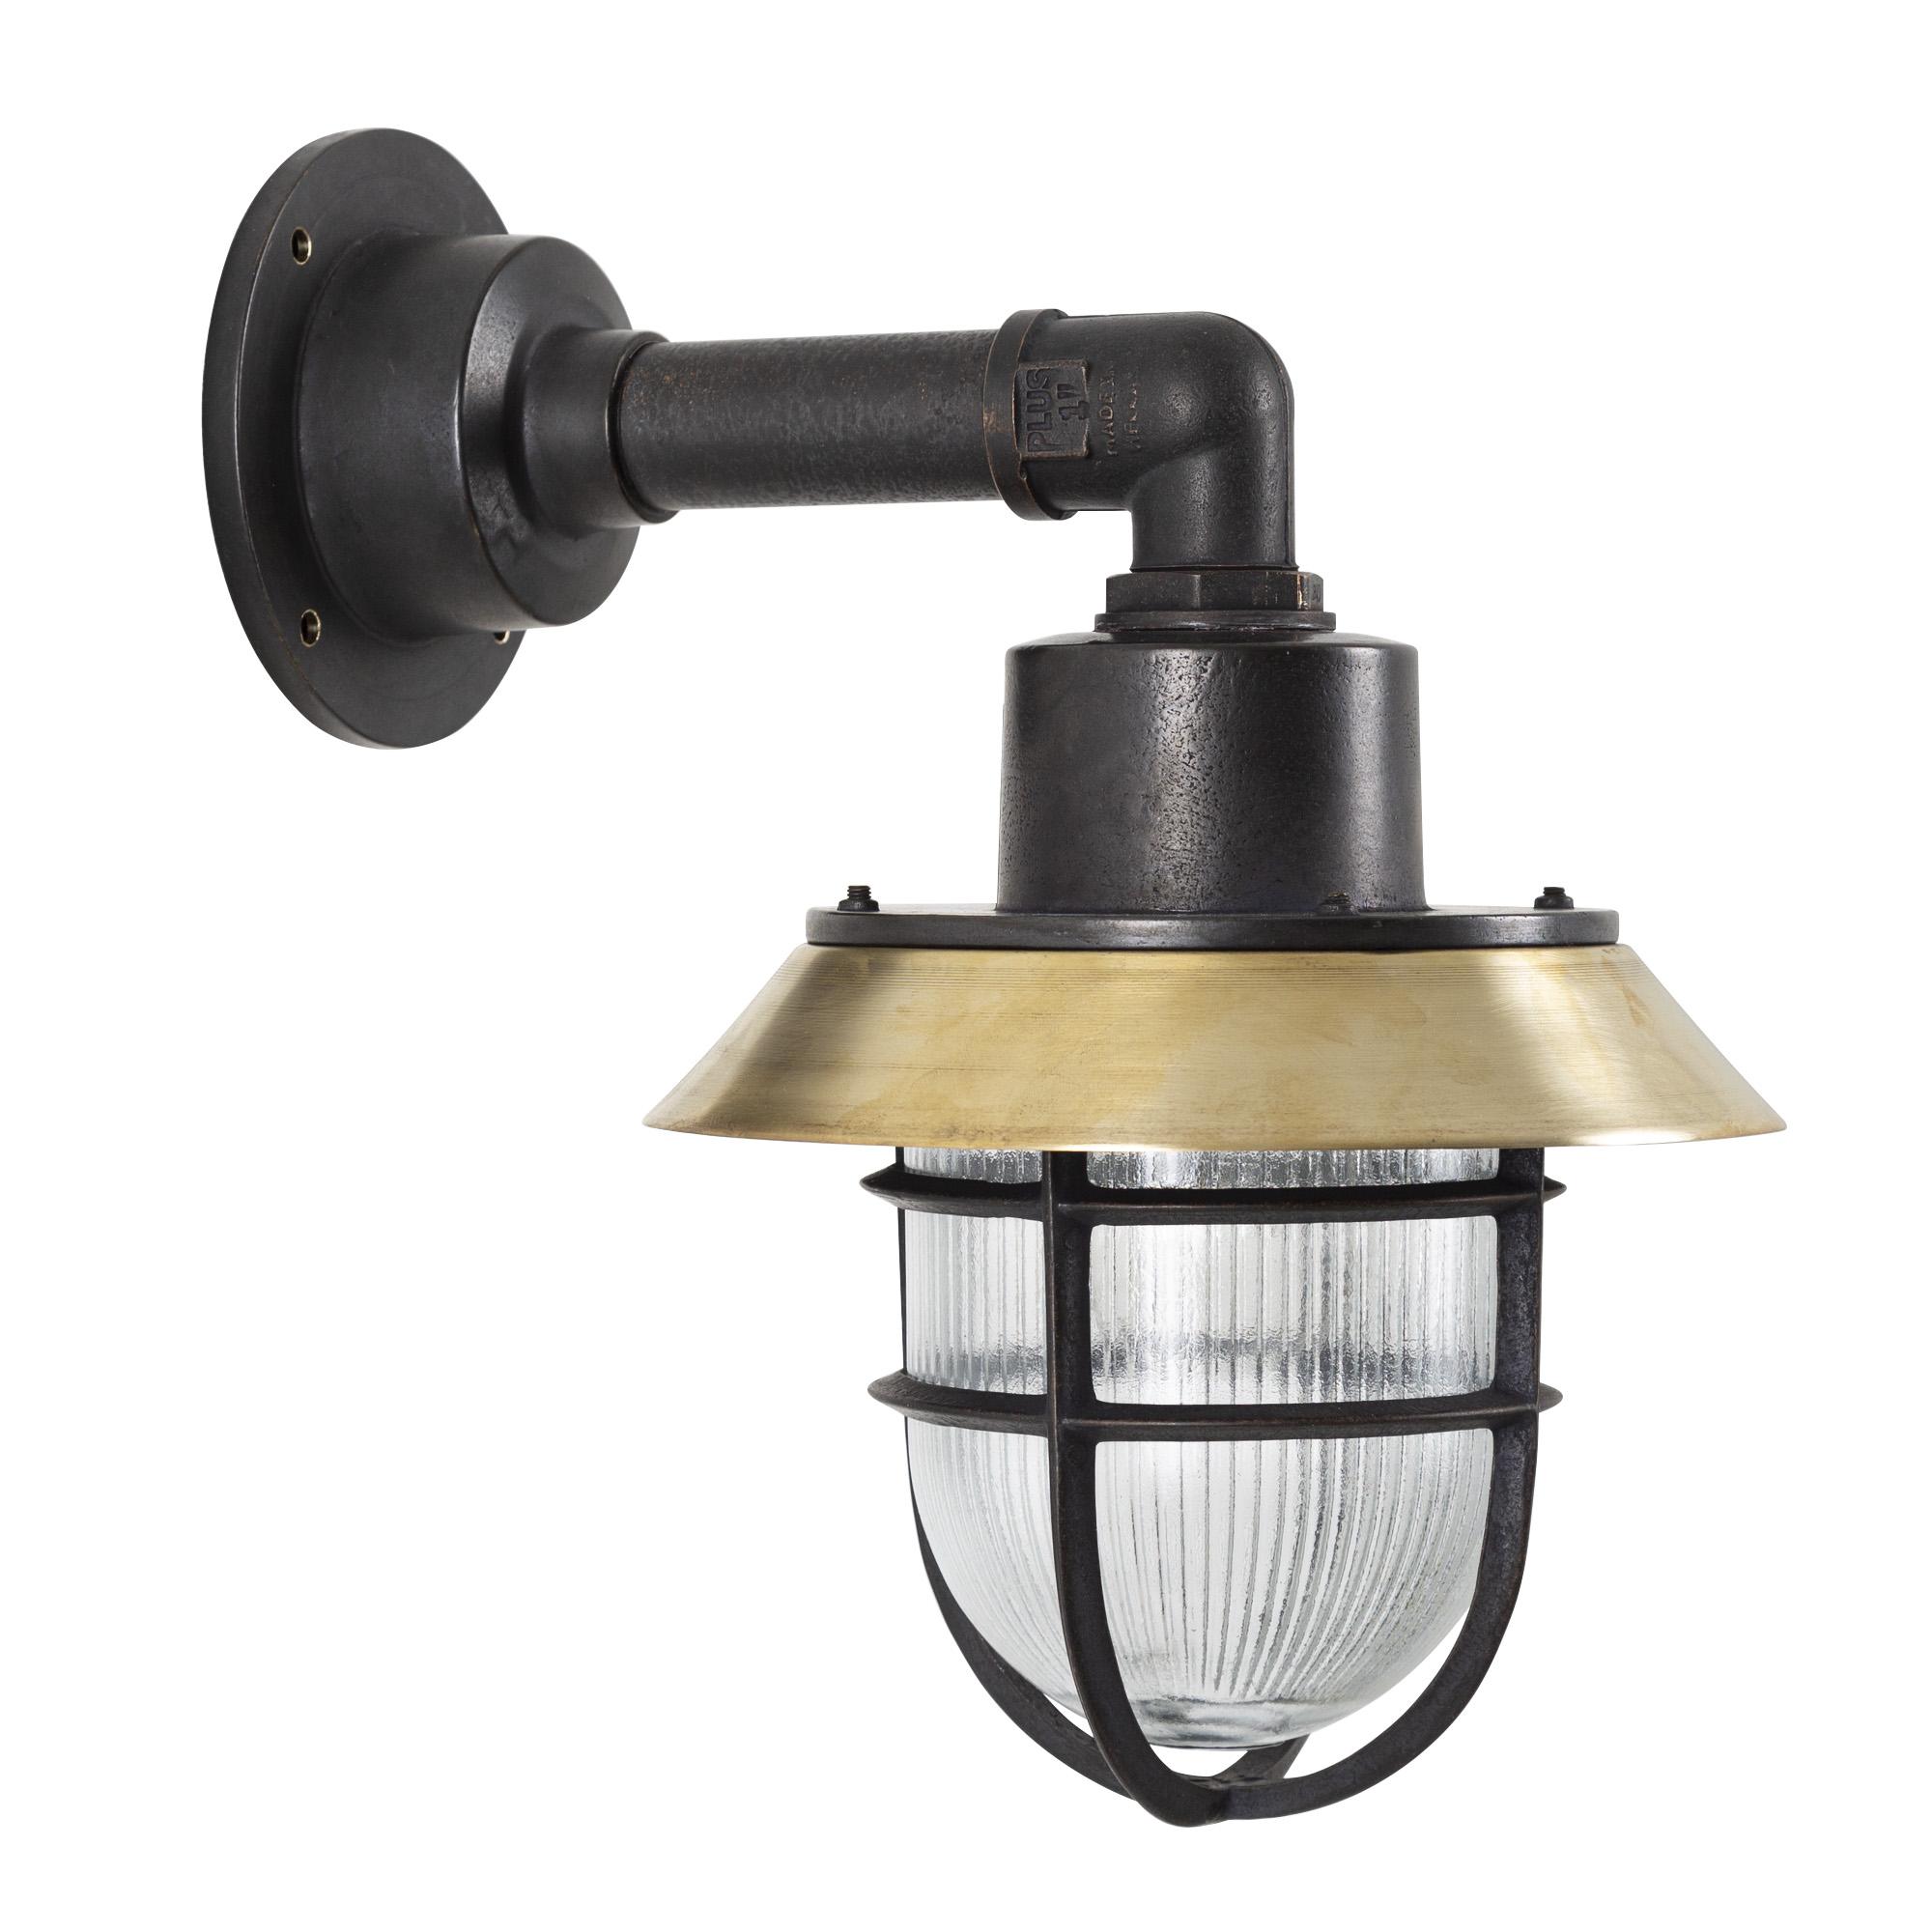 Dockyard Muurlamp Zwart